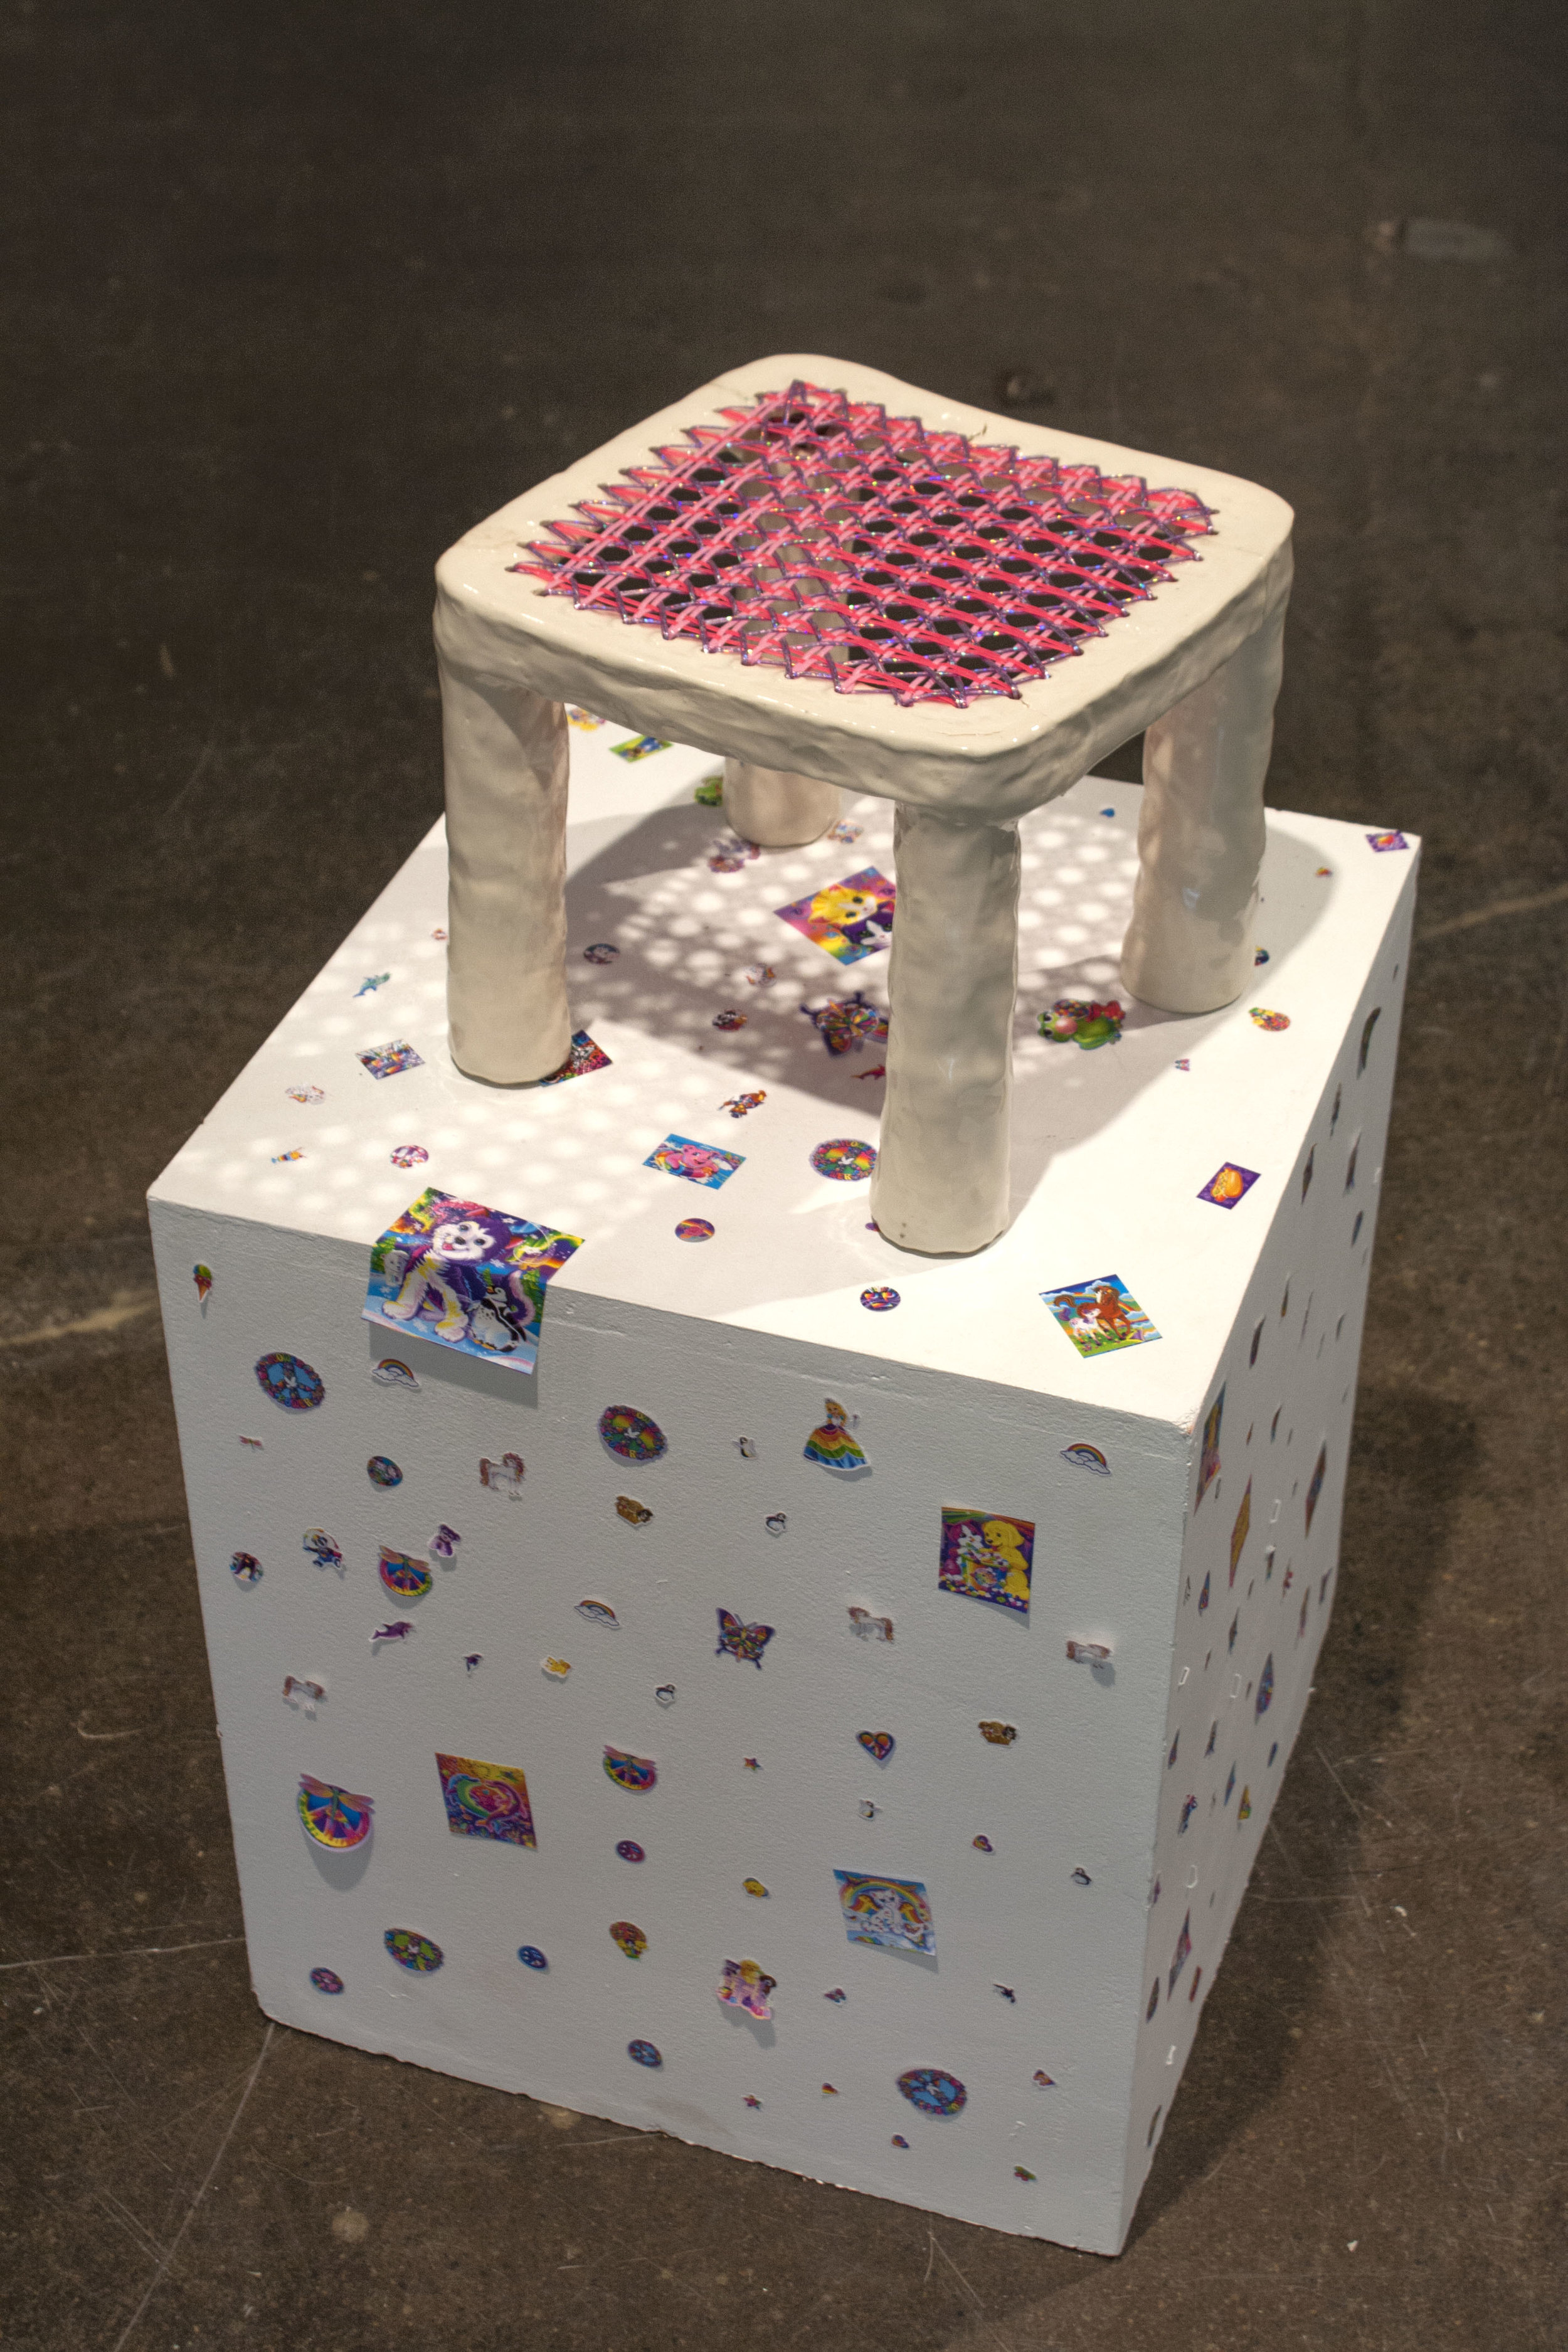 "Stool 1 (Lisa Frank), Ceramic sculpture, palstic lacing cord, 10"" x 10"" x 10"", 2018"